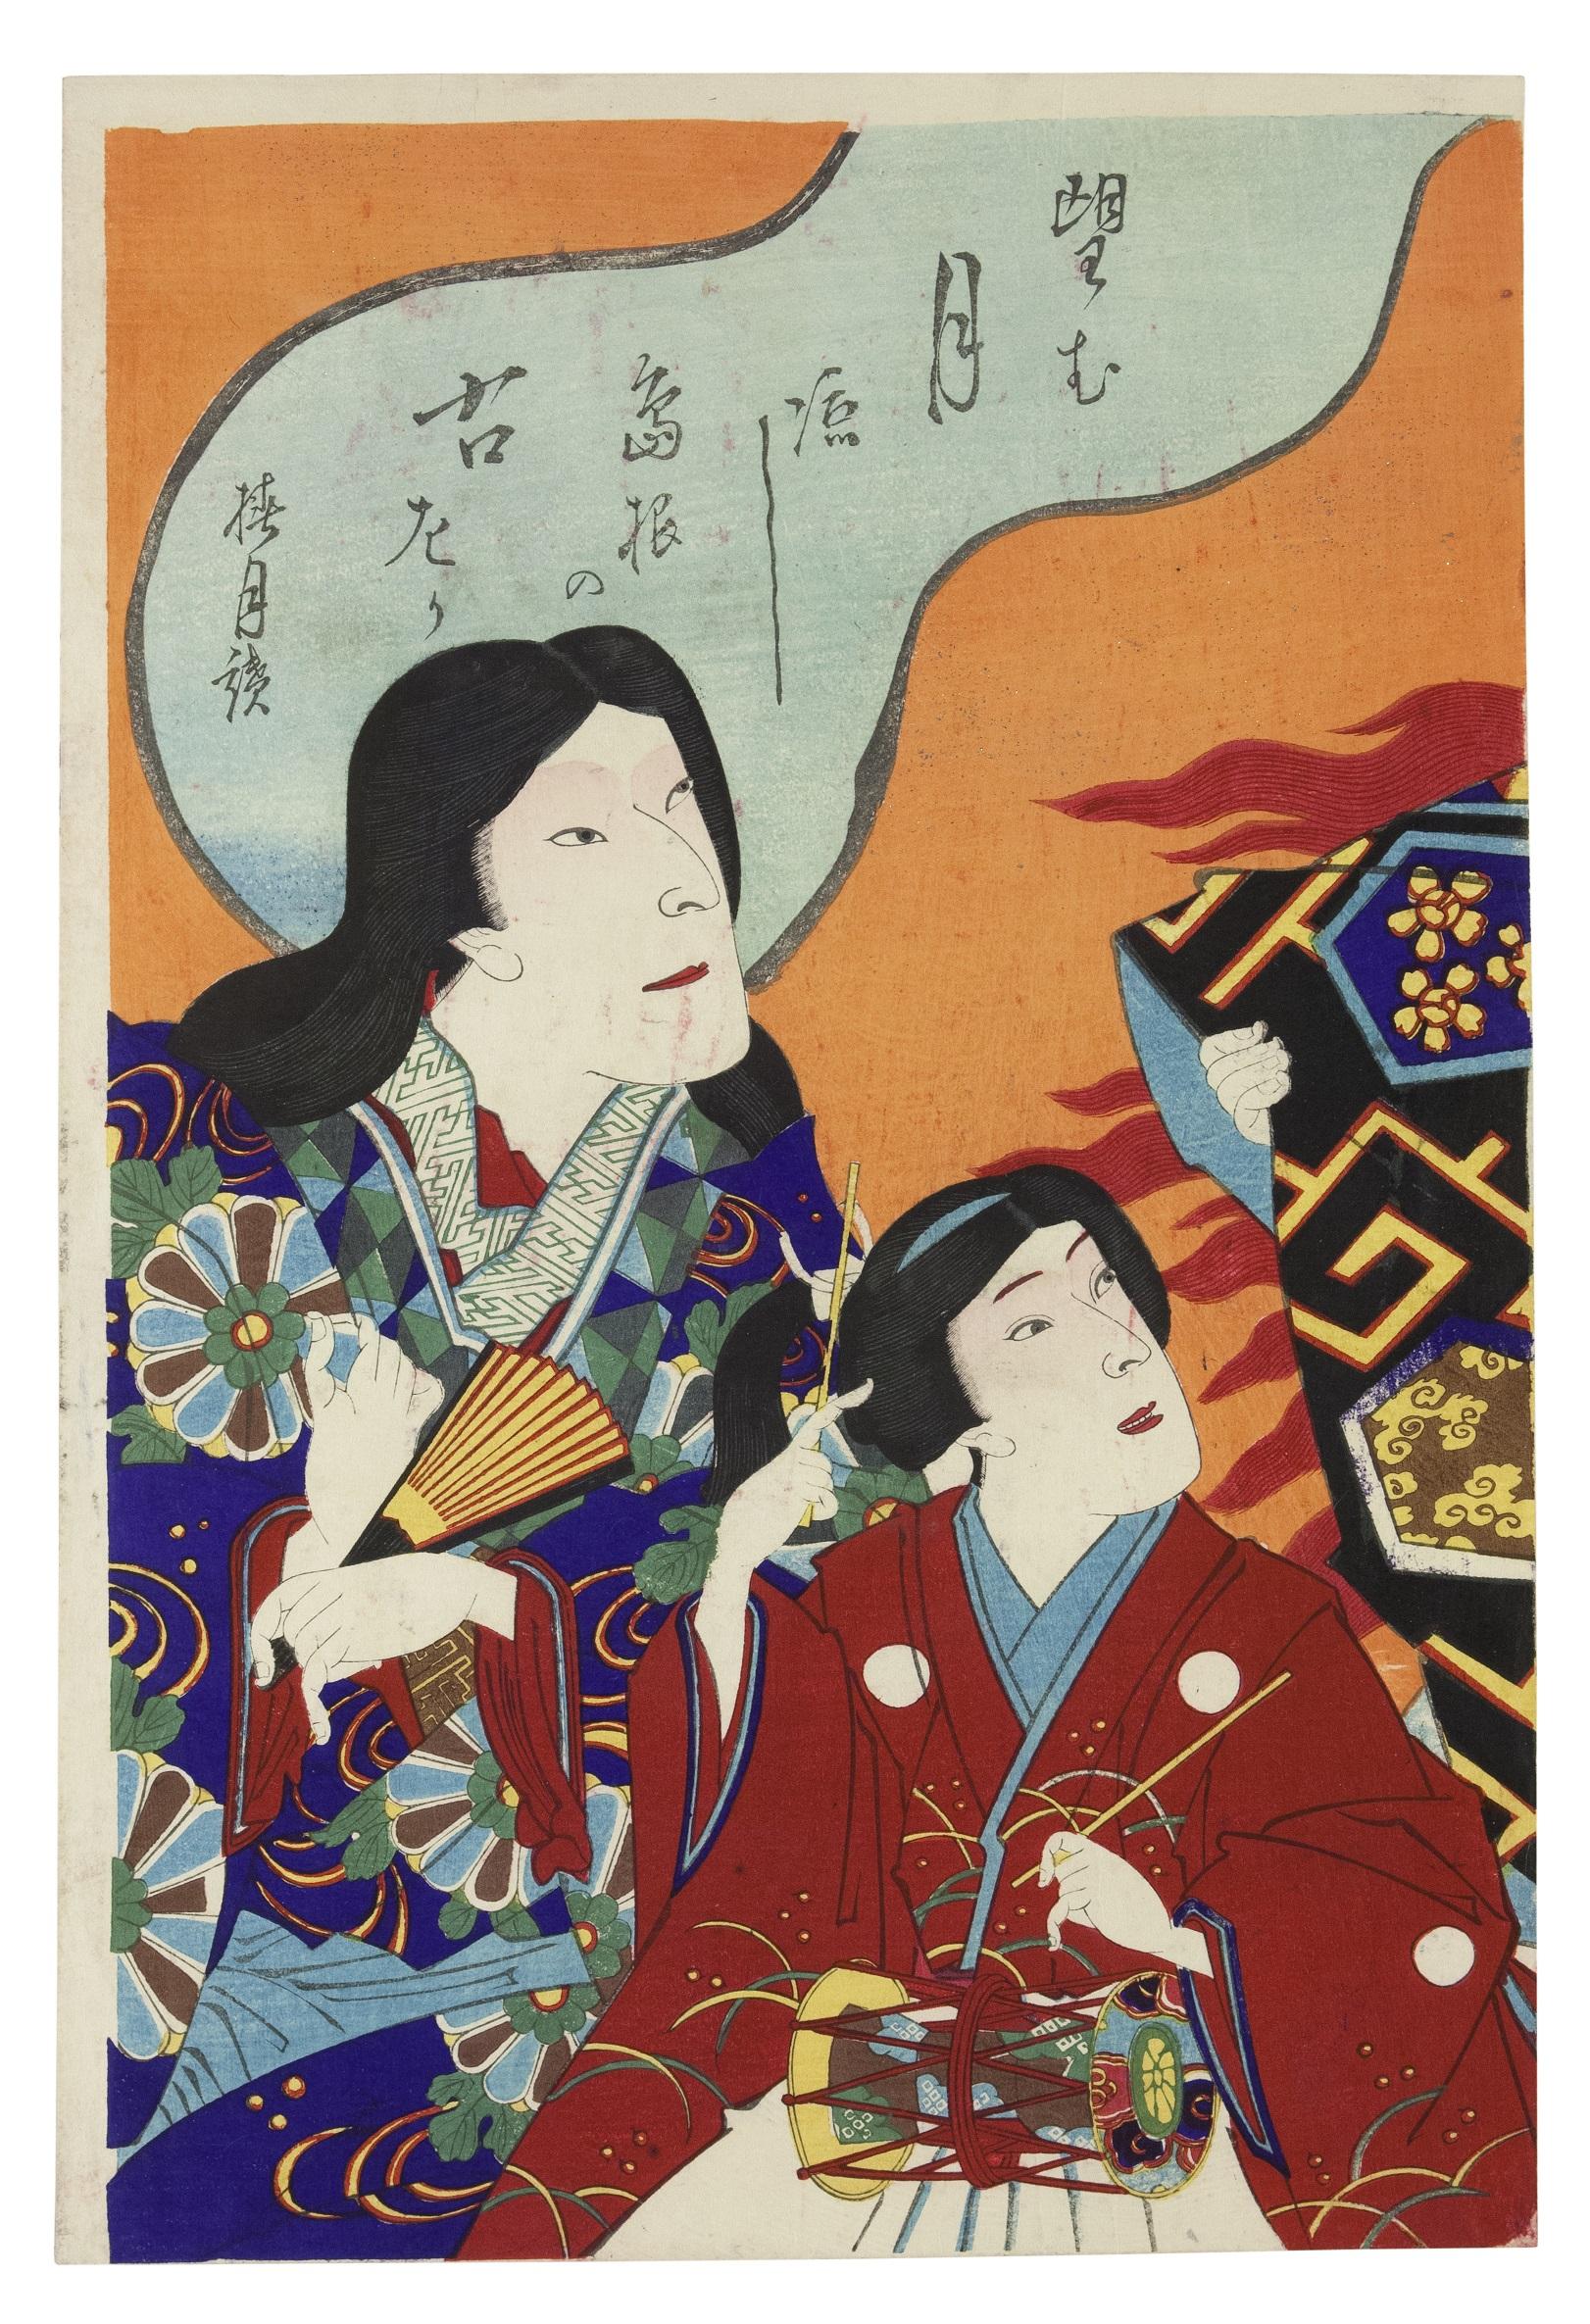 Spotlight On: The Kimono